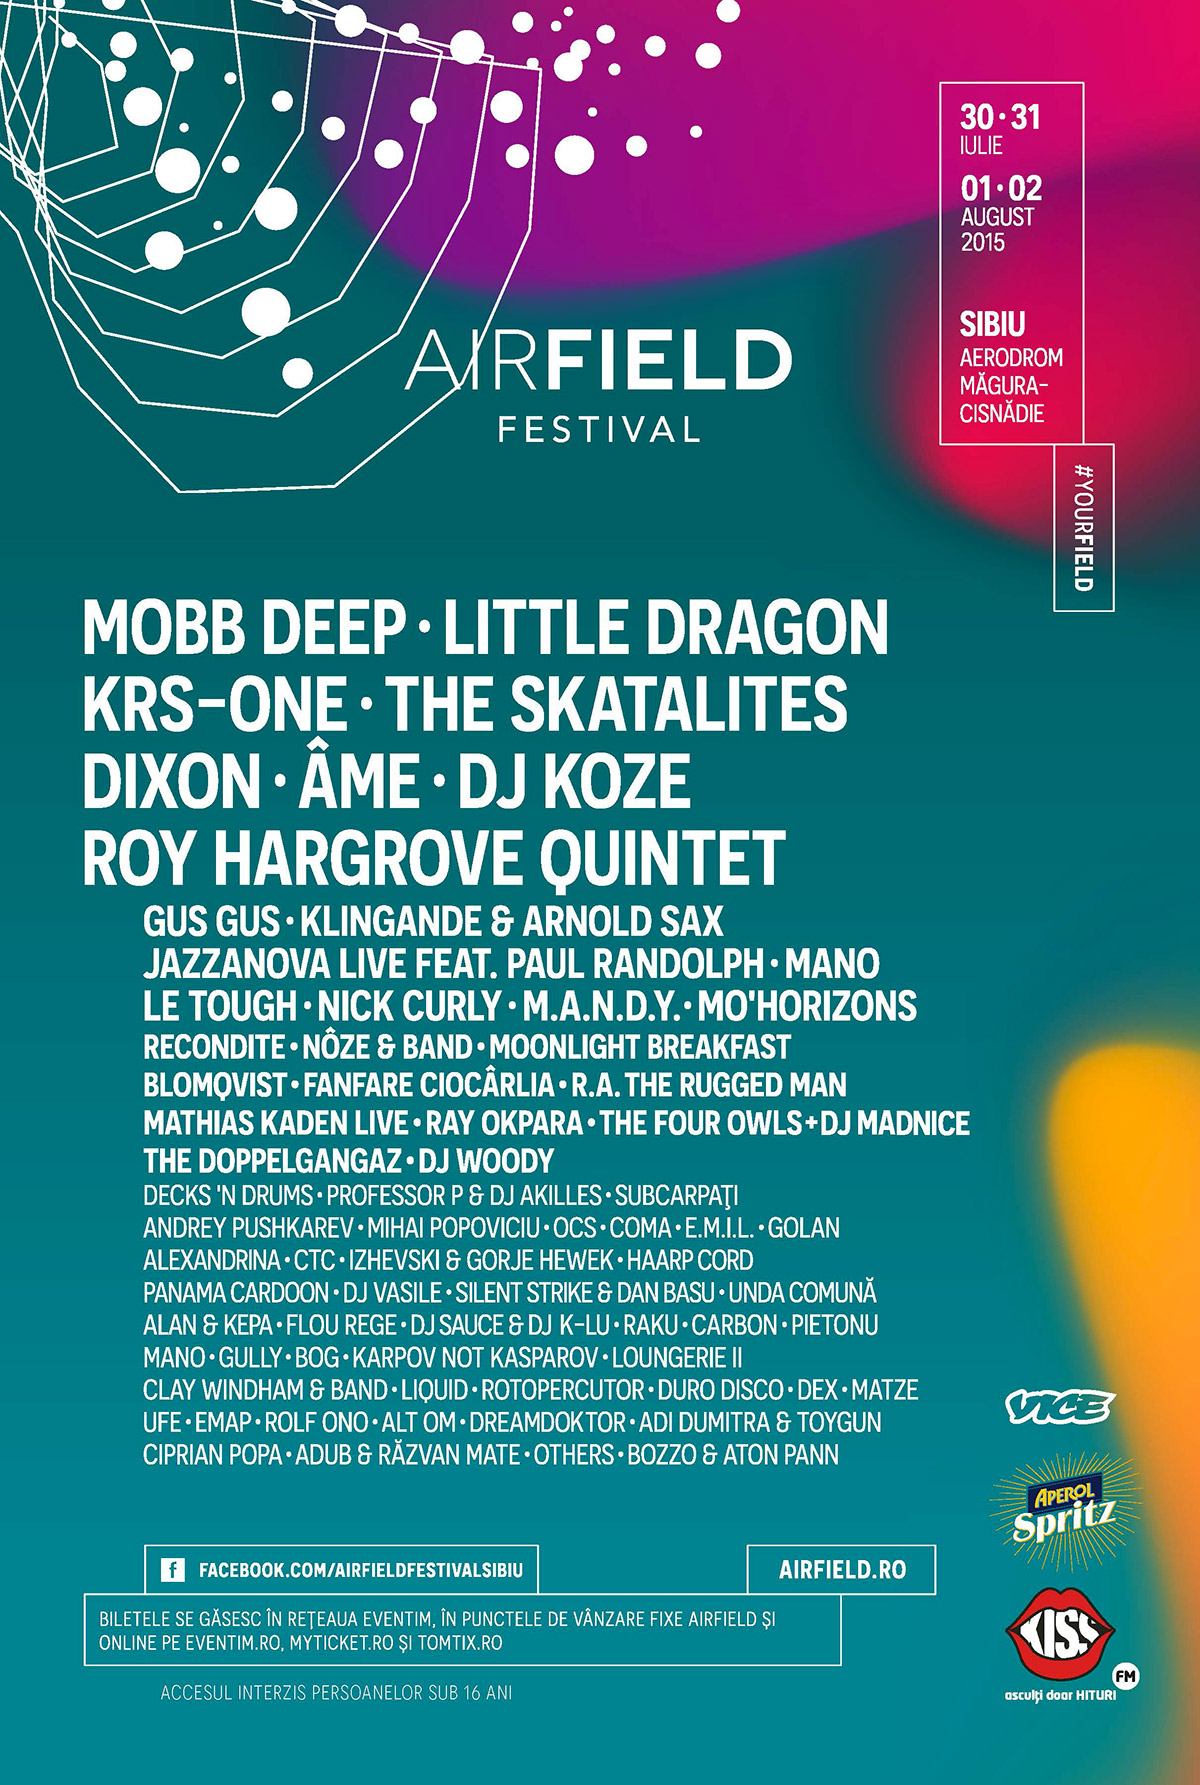 AIRFIELD FESTIVAL 2015